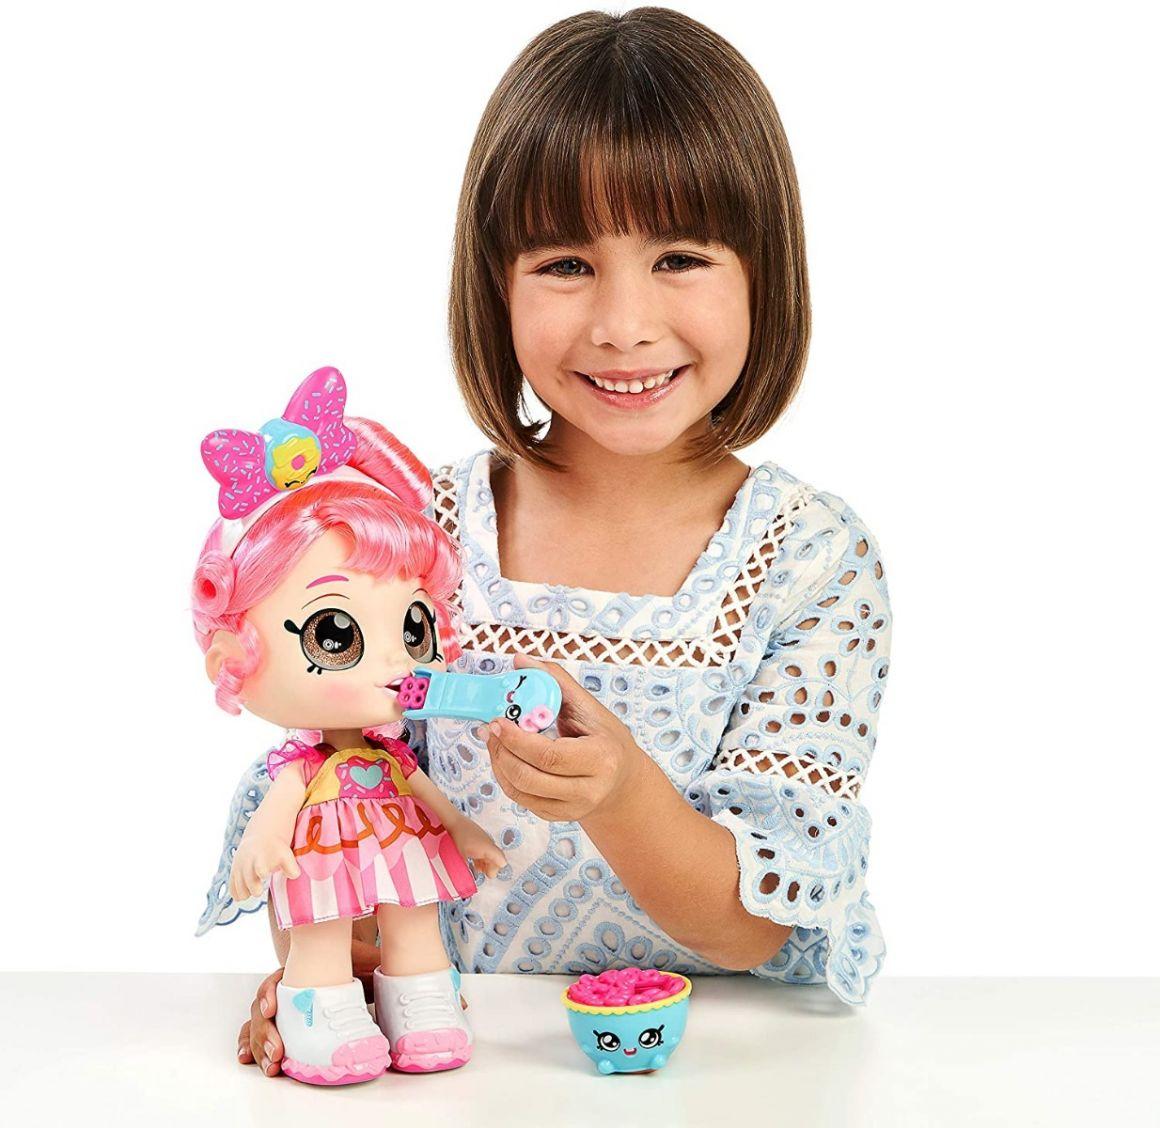 Kindi Kids - Lalka Donatina + Akcesoria na przekąskę